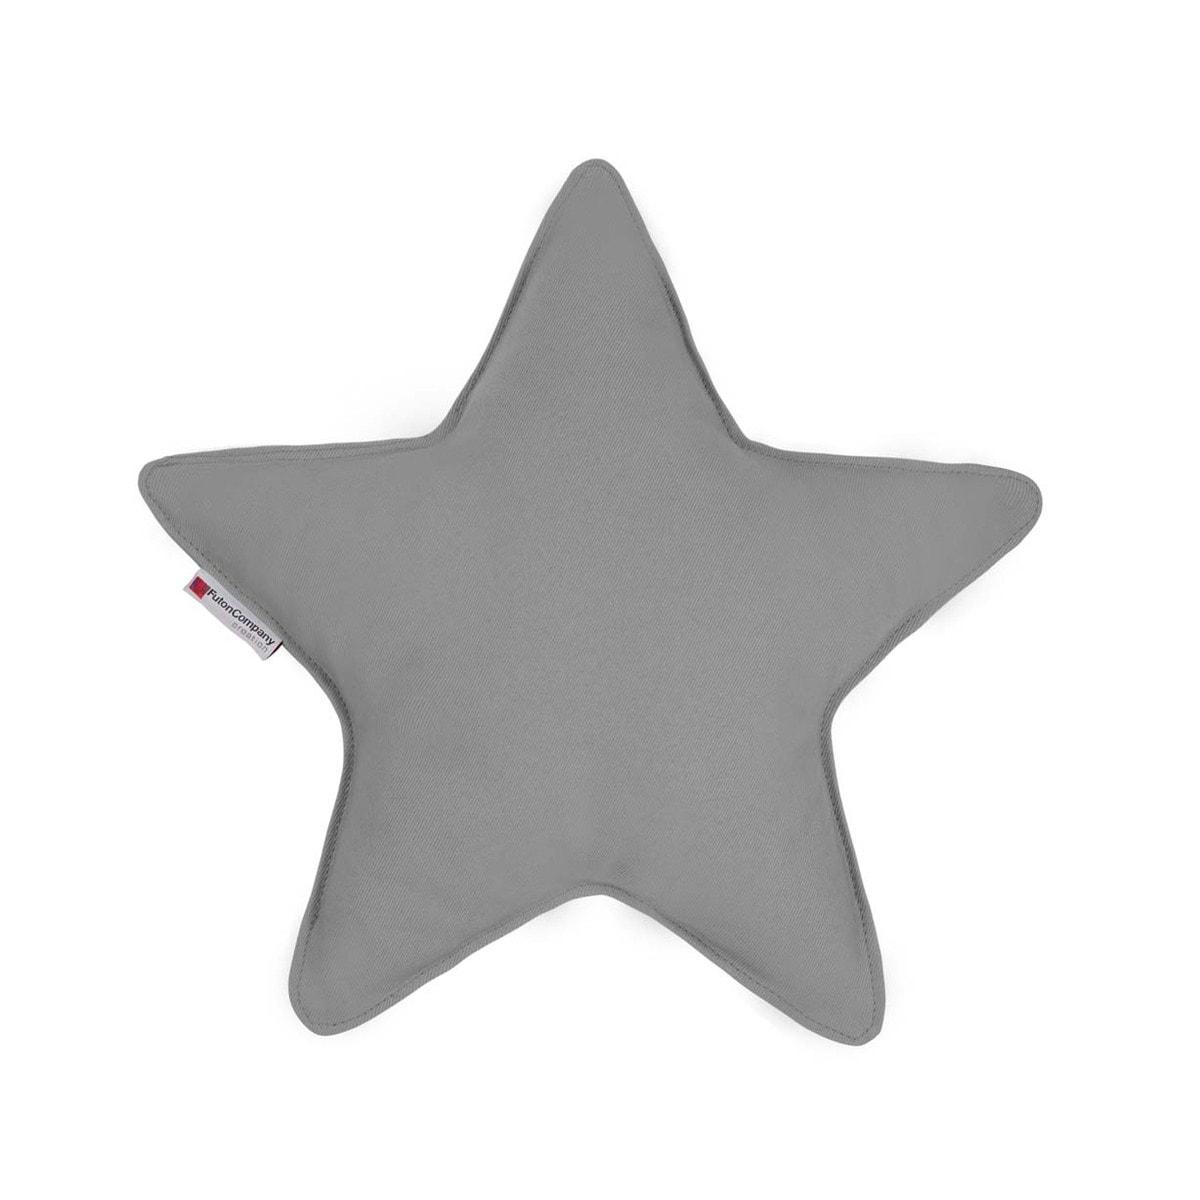 Almofada-Star-Sharp-M-Tecido-Sarja-Cinza-City-01-okk